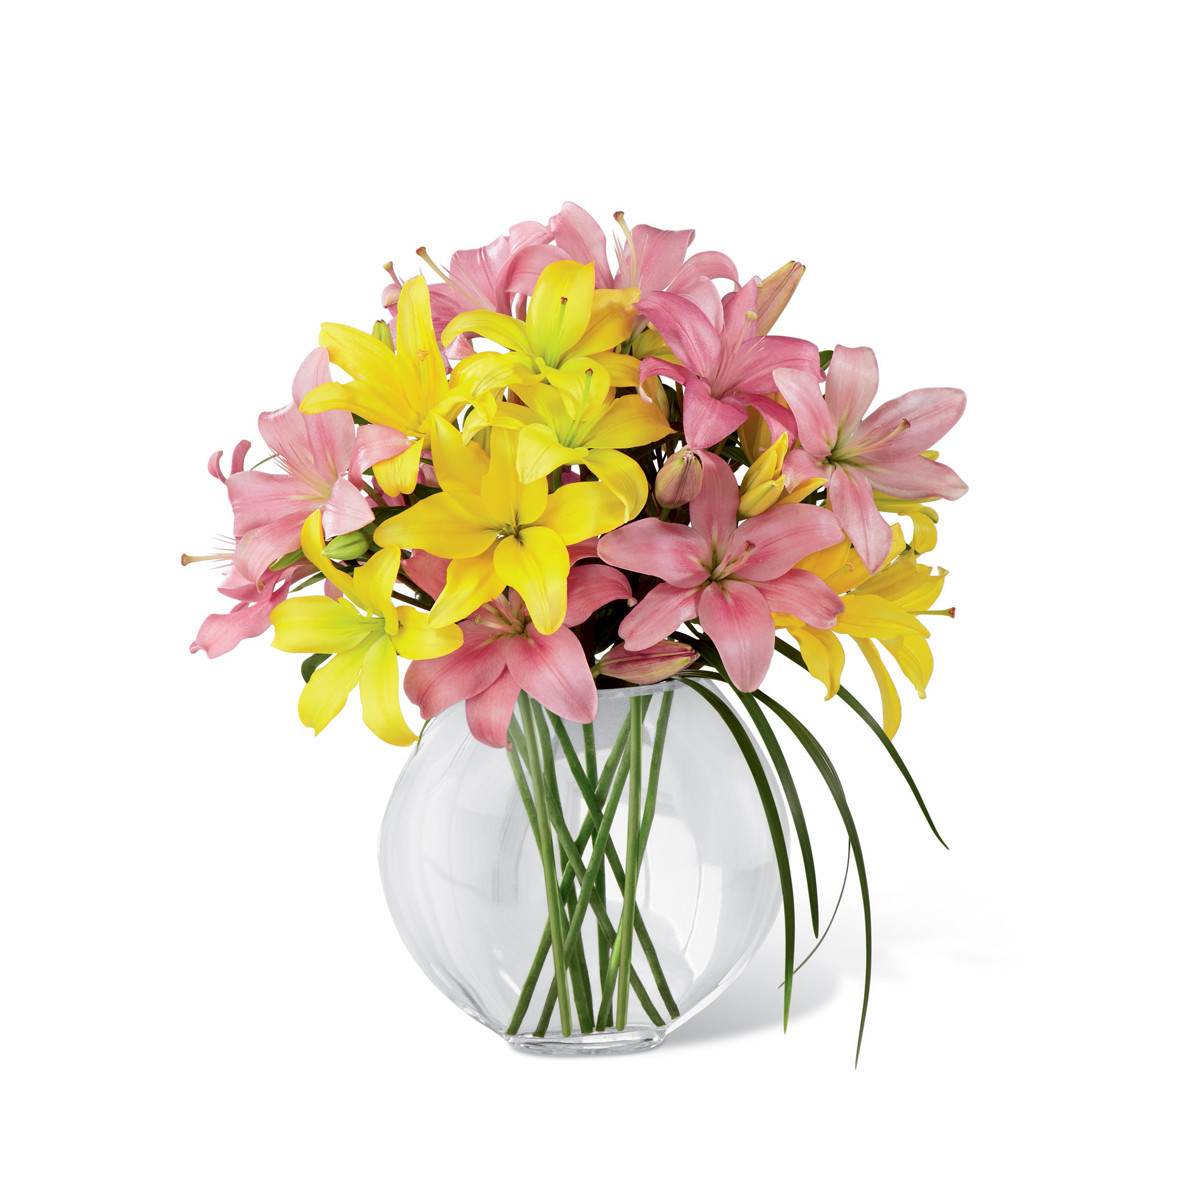 The FTD Lilies & More™ Bouquet Urbandale IA Florist